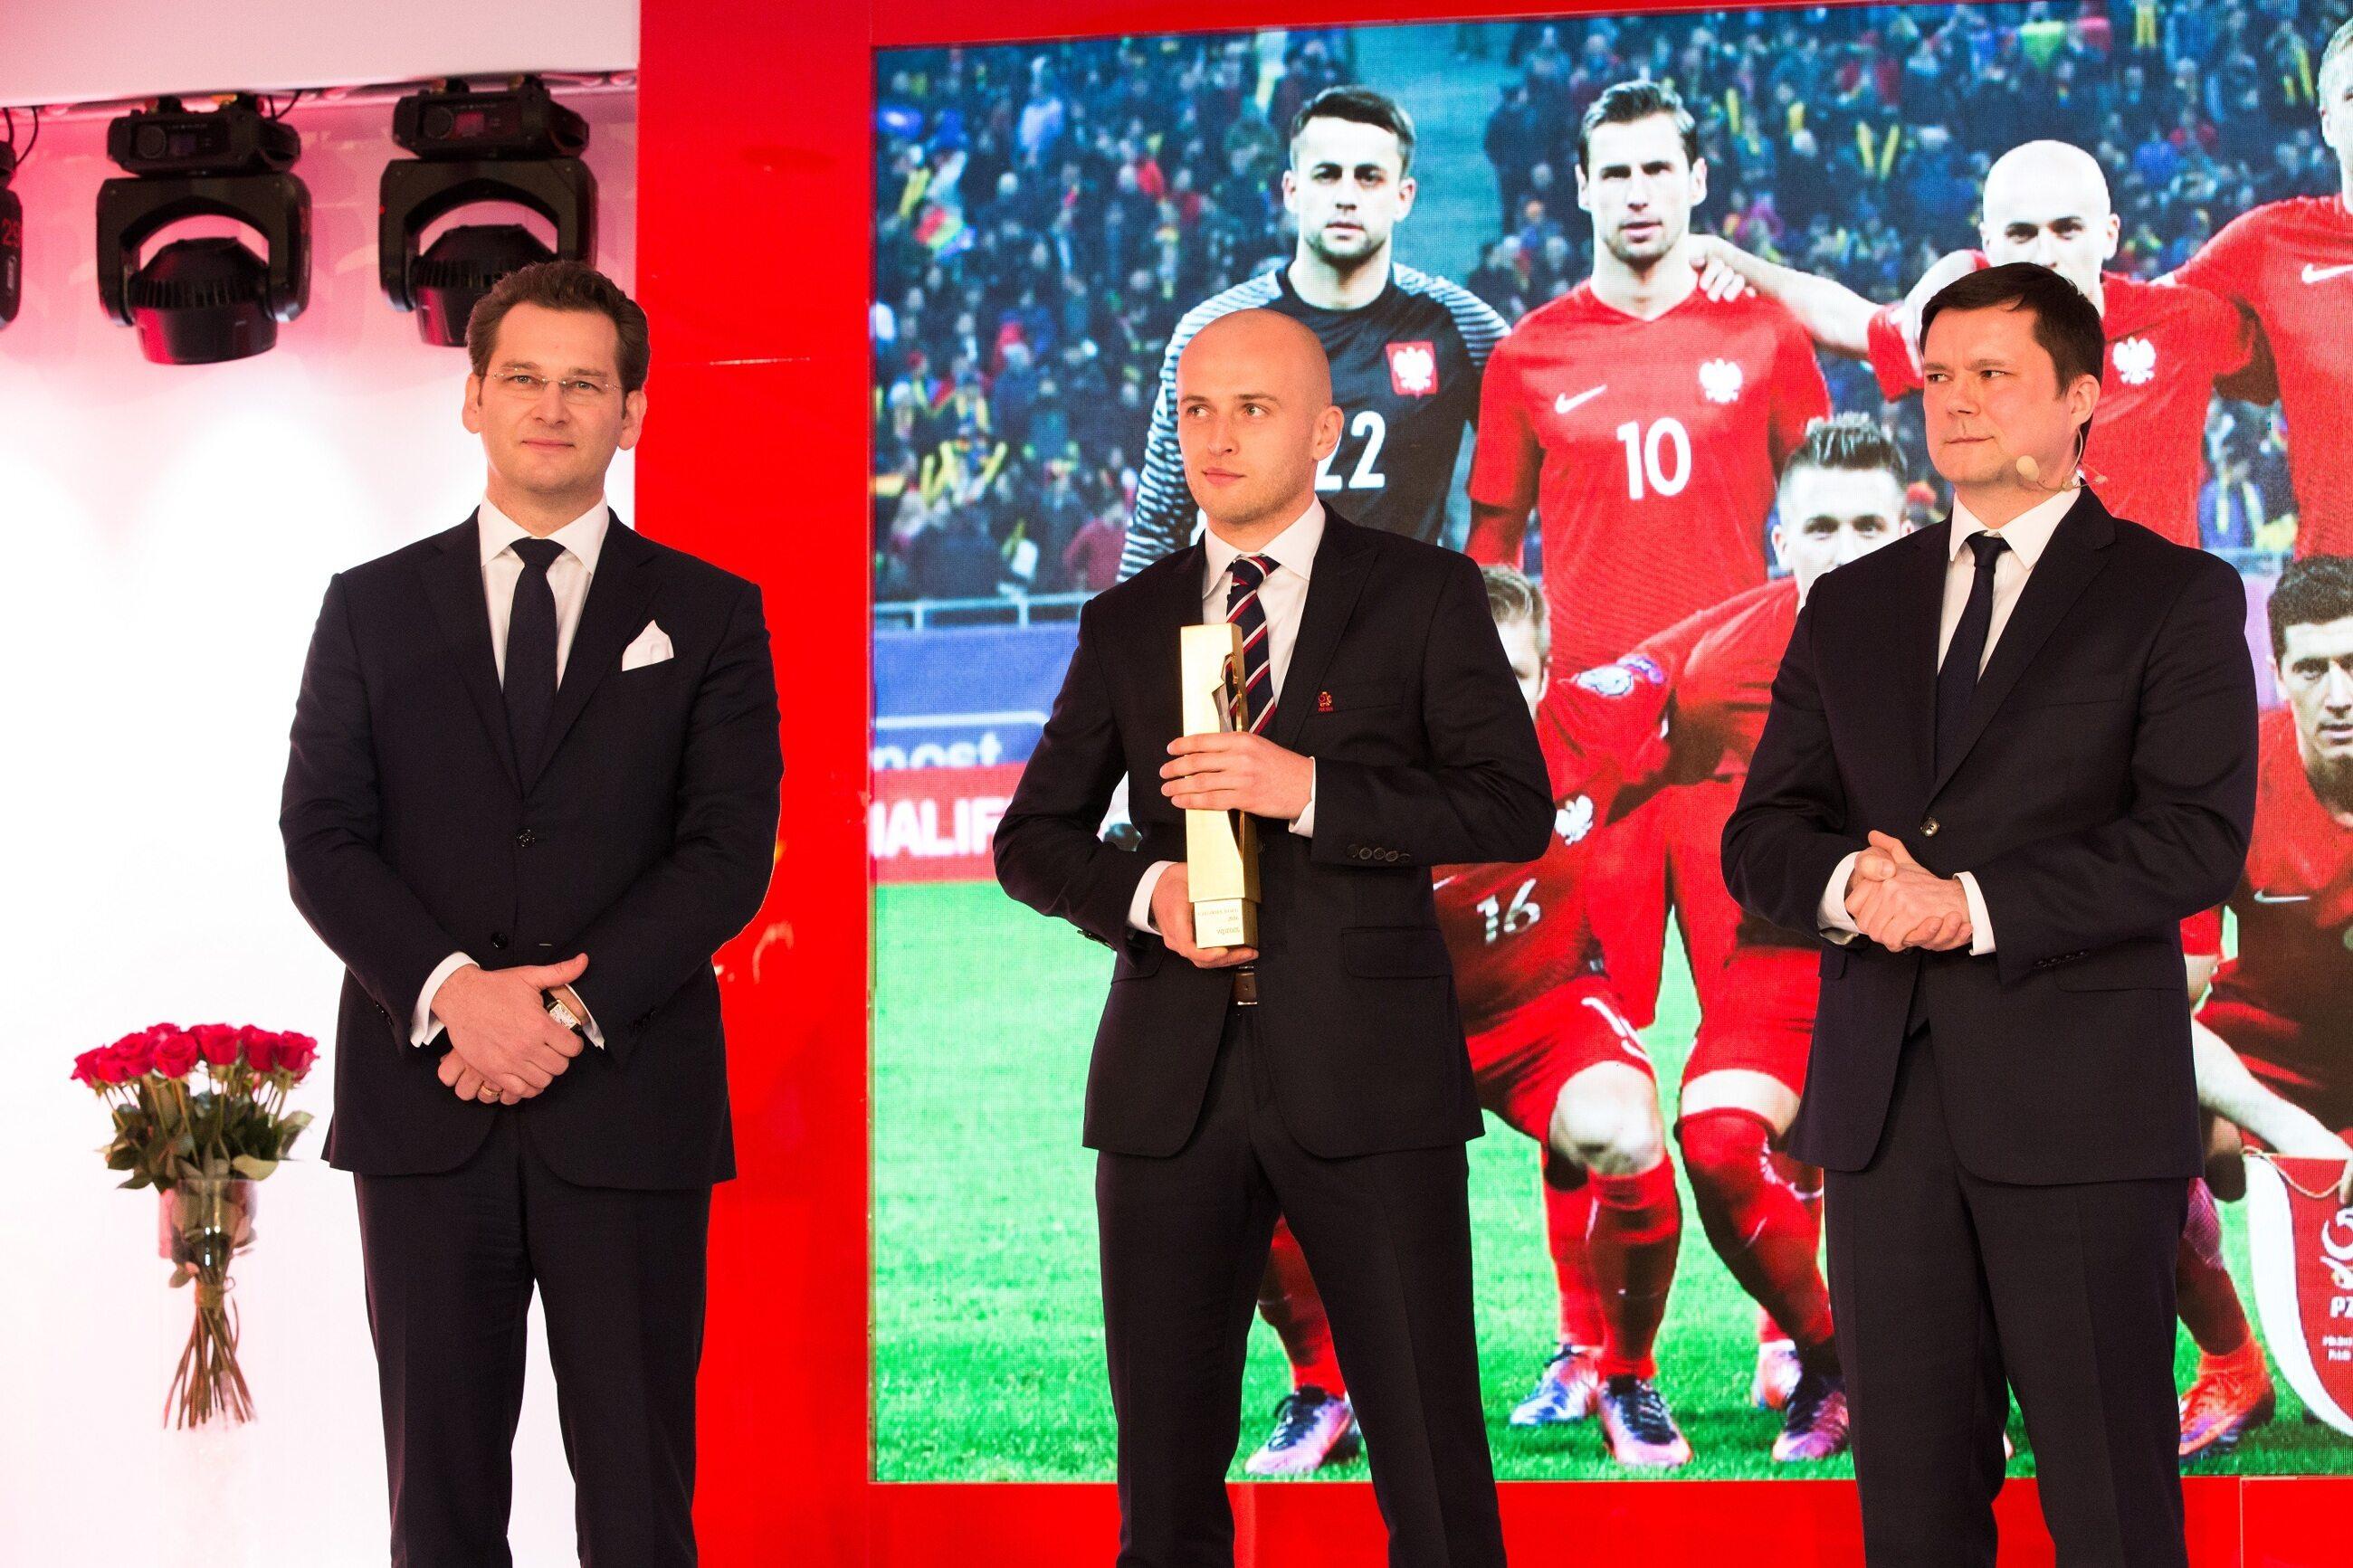 Michał M. Lisiecki, Michał Pazdan, Jacek Pochłopień